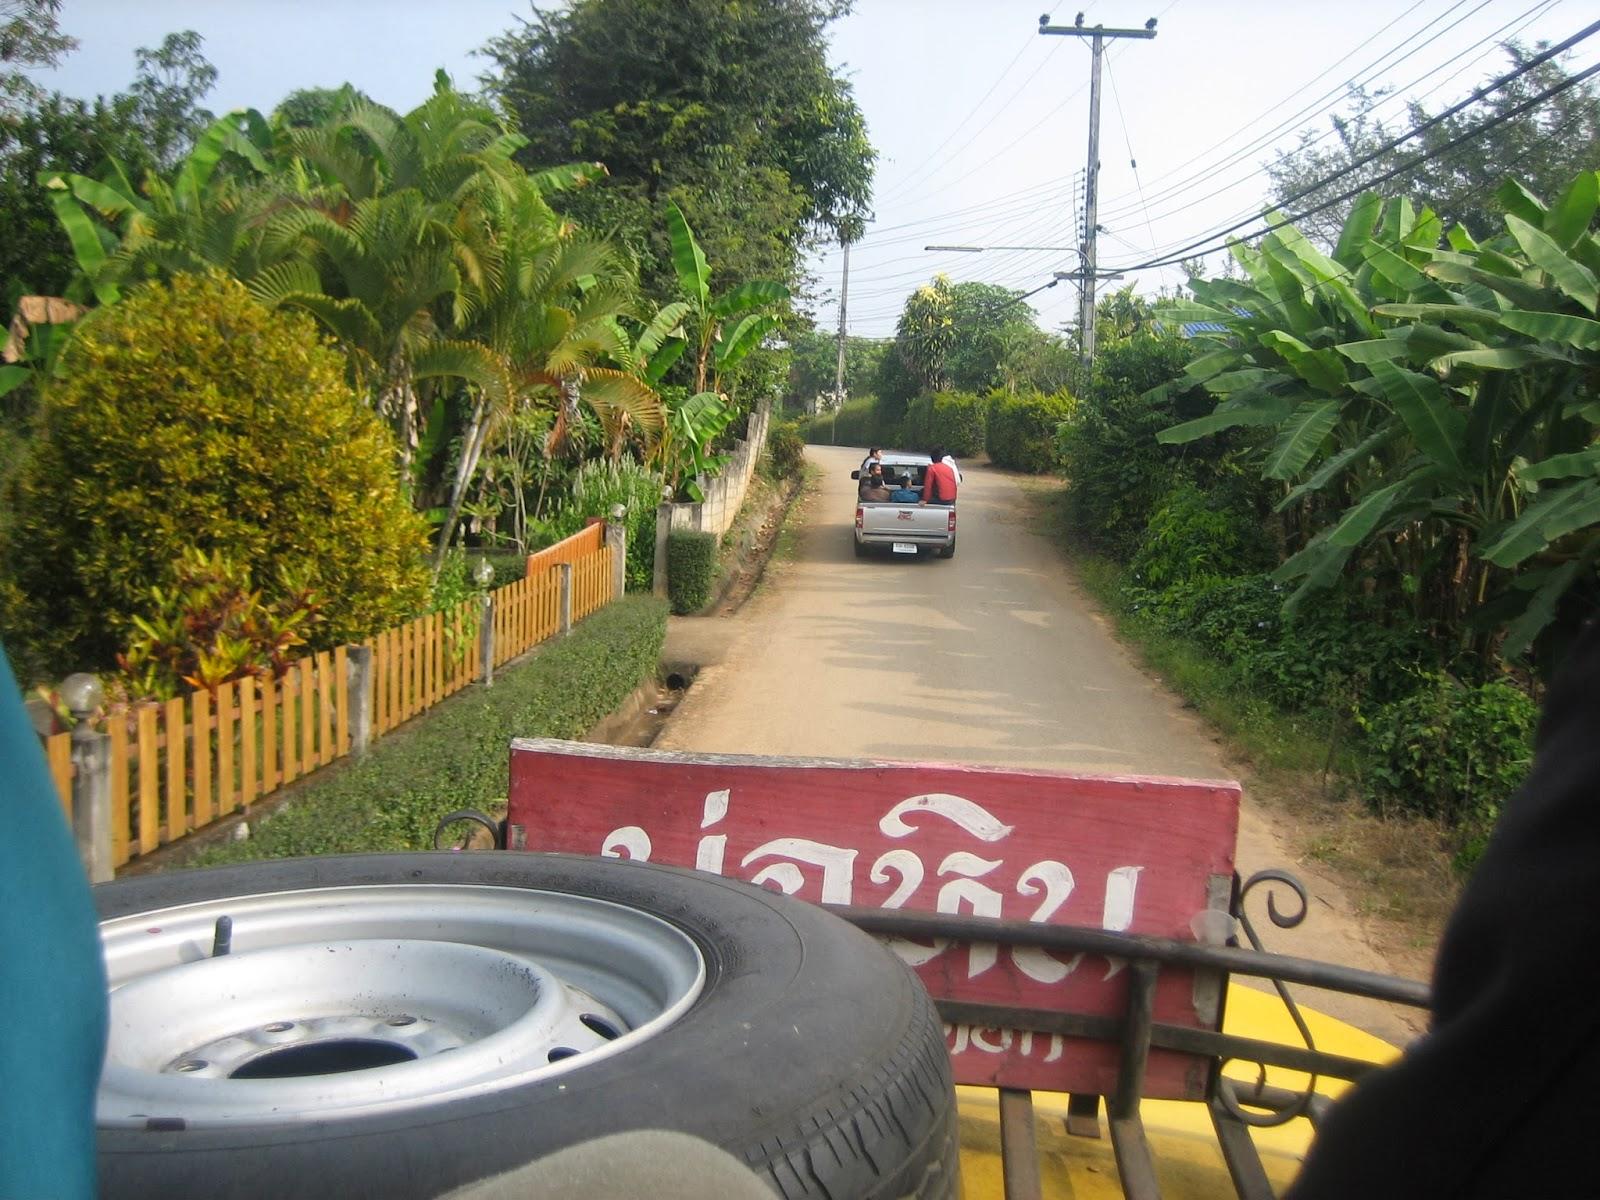 samoeng-thailand-village-truck-roof